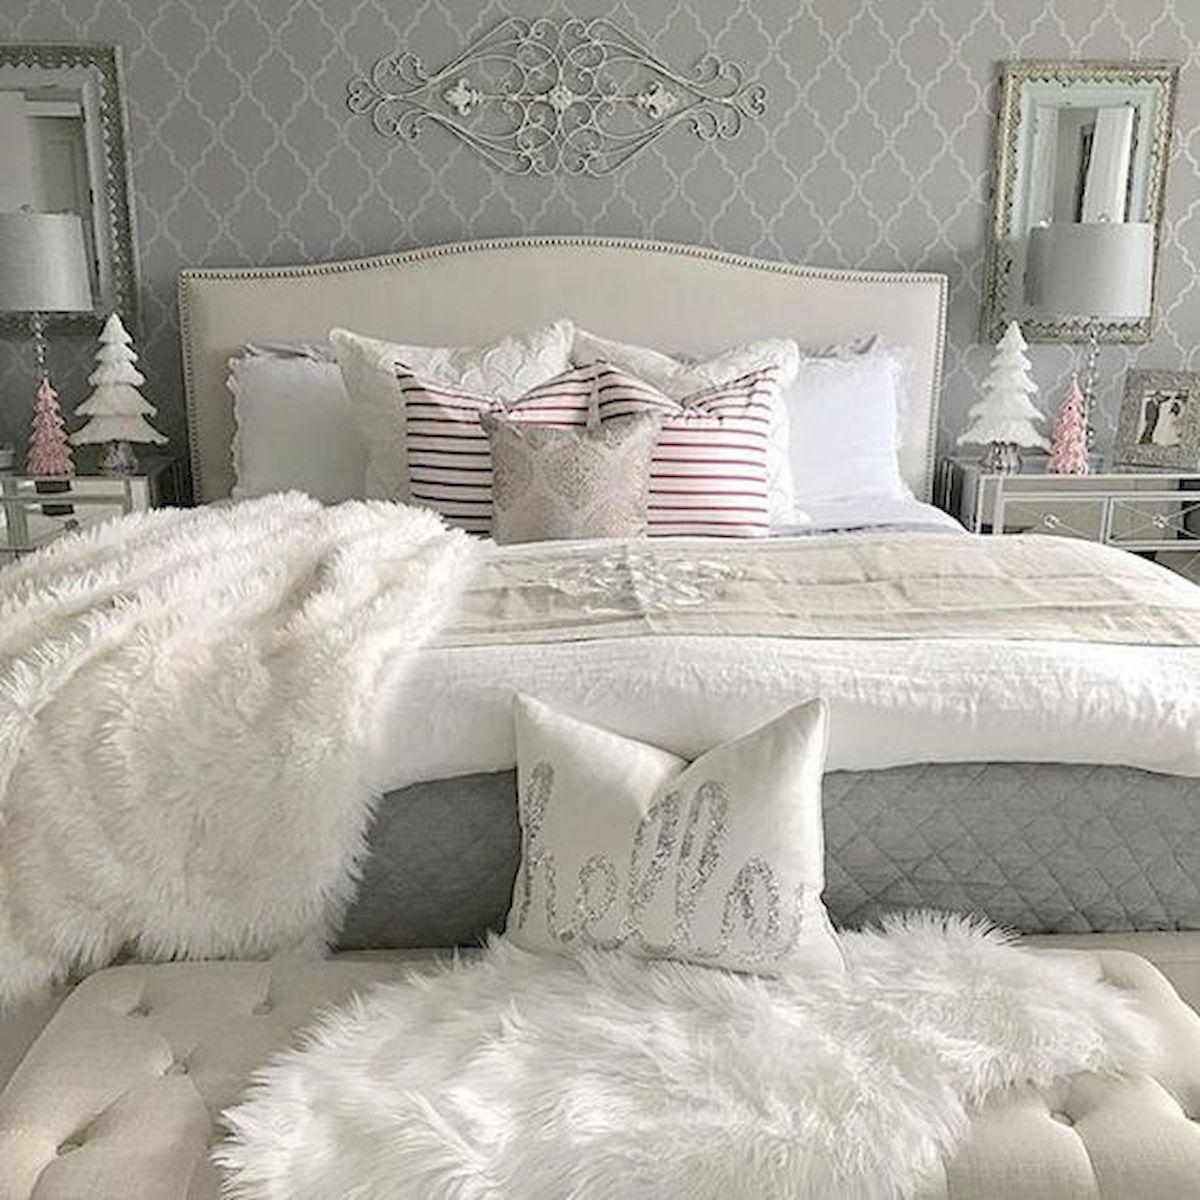 37 Simple Summer Bedroom Decor Ideas (19)